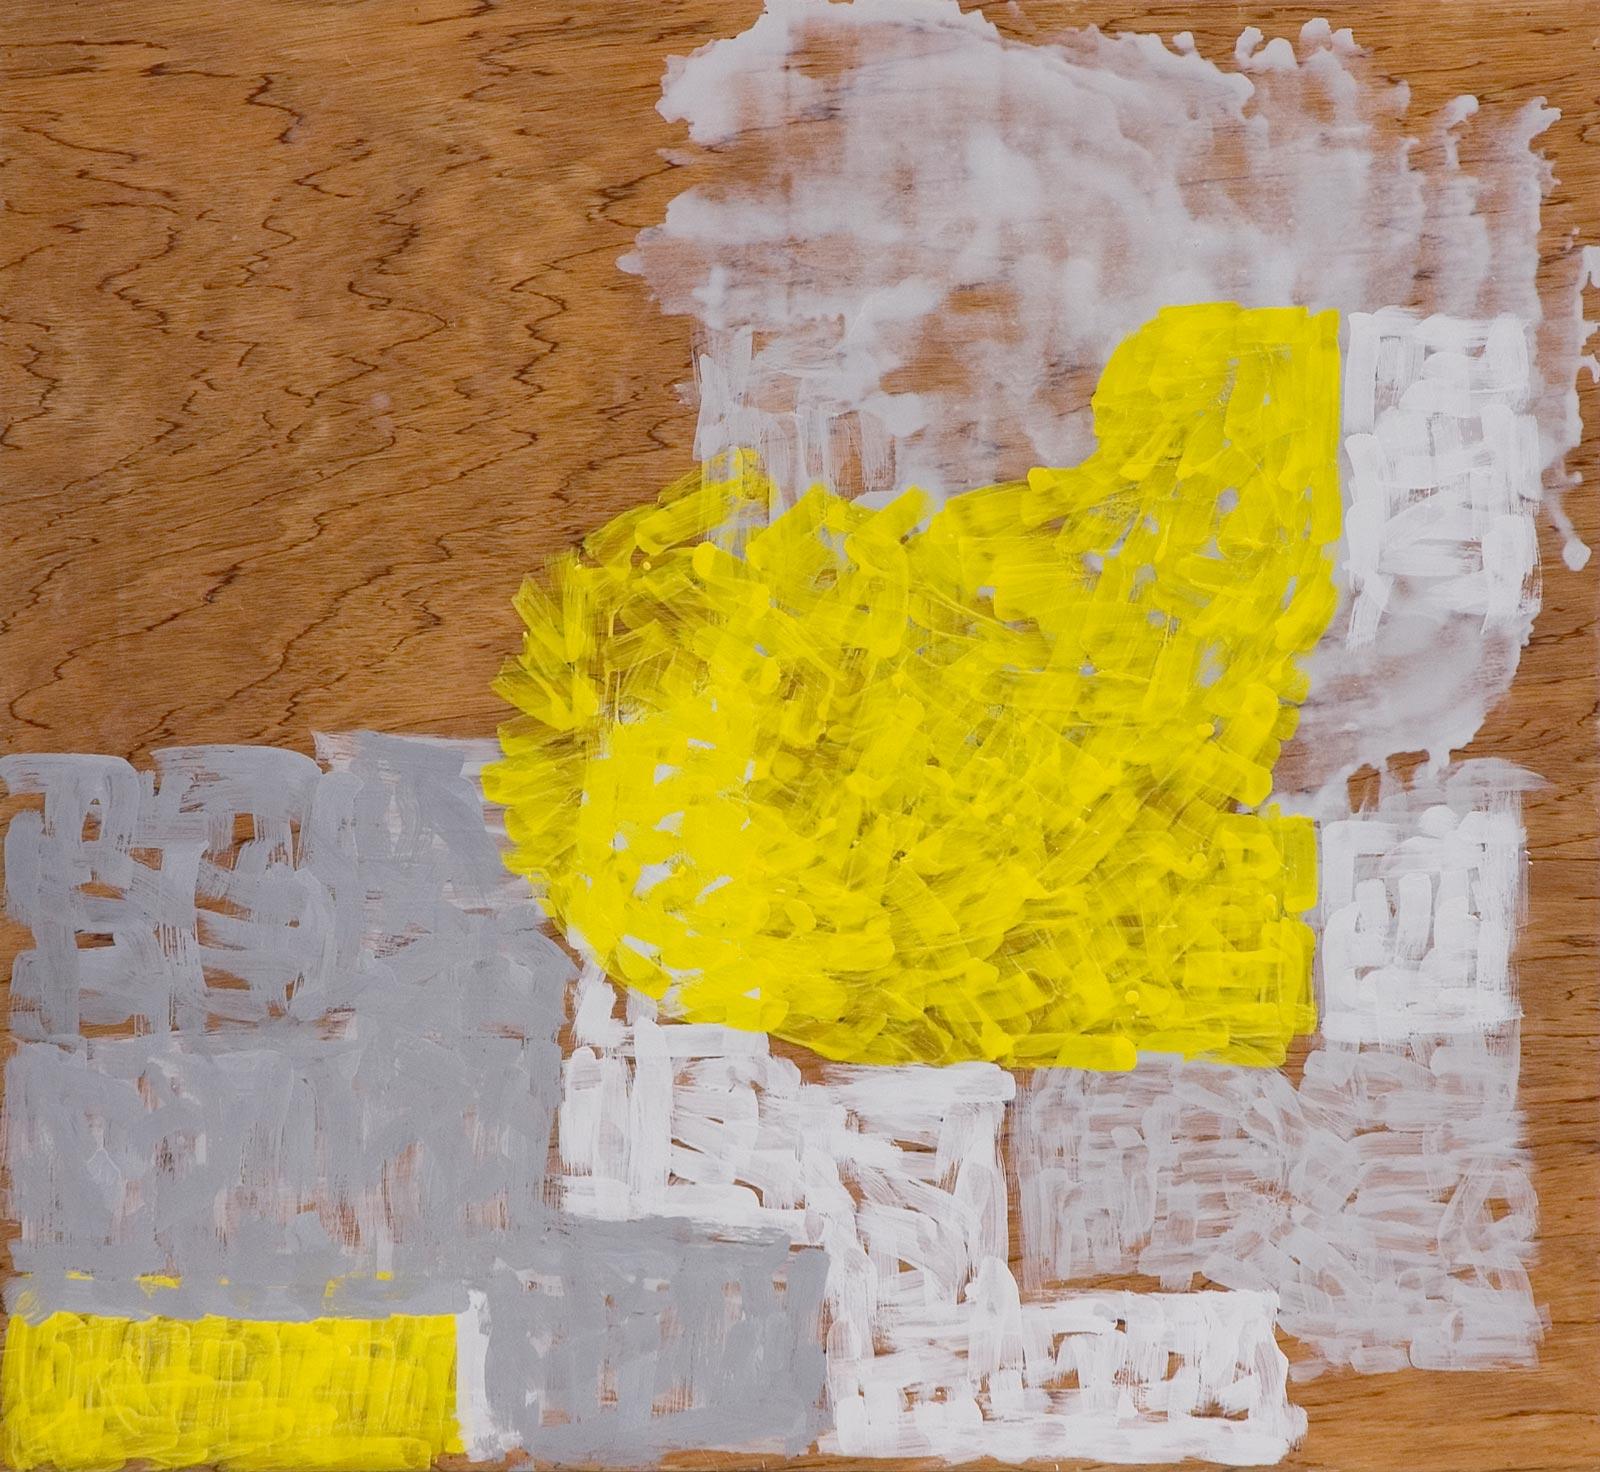 Maridalen #2, 2004, encaustic on plywood,107 x 117 cm